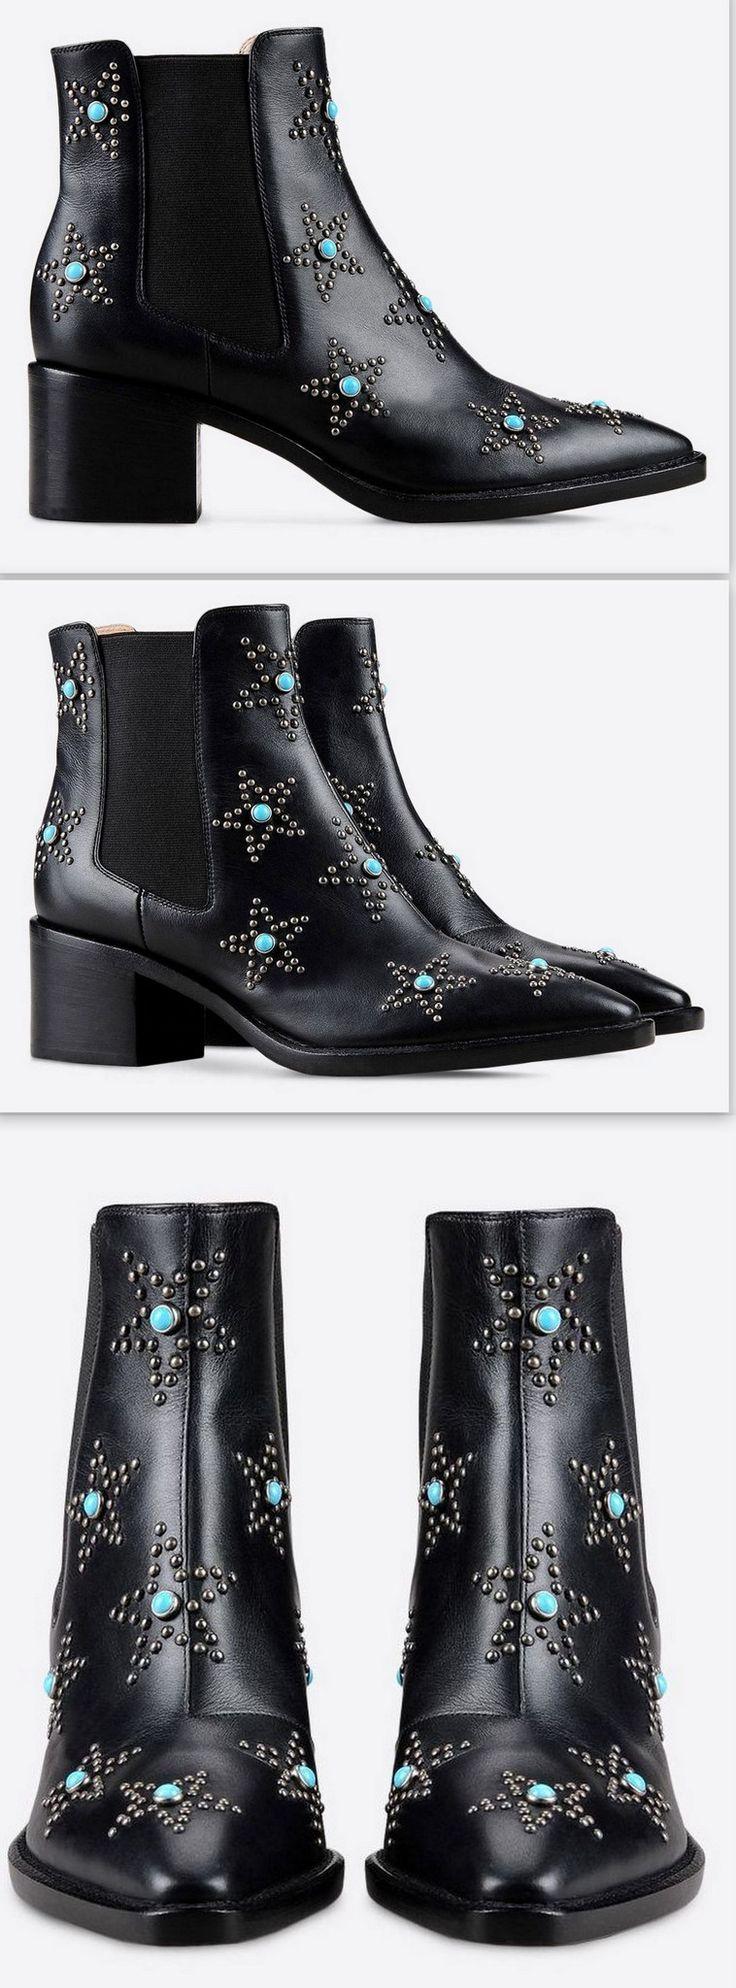 'Star Studded' Beatle Boot-Black